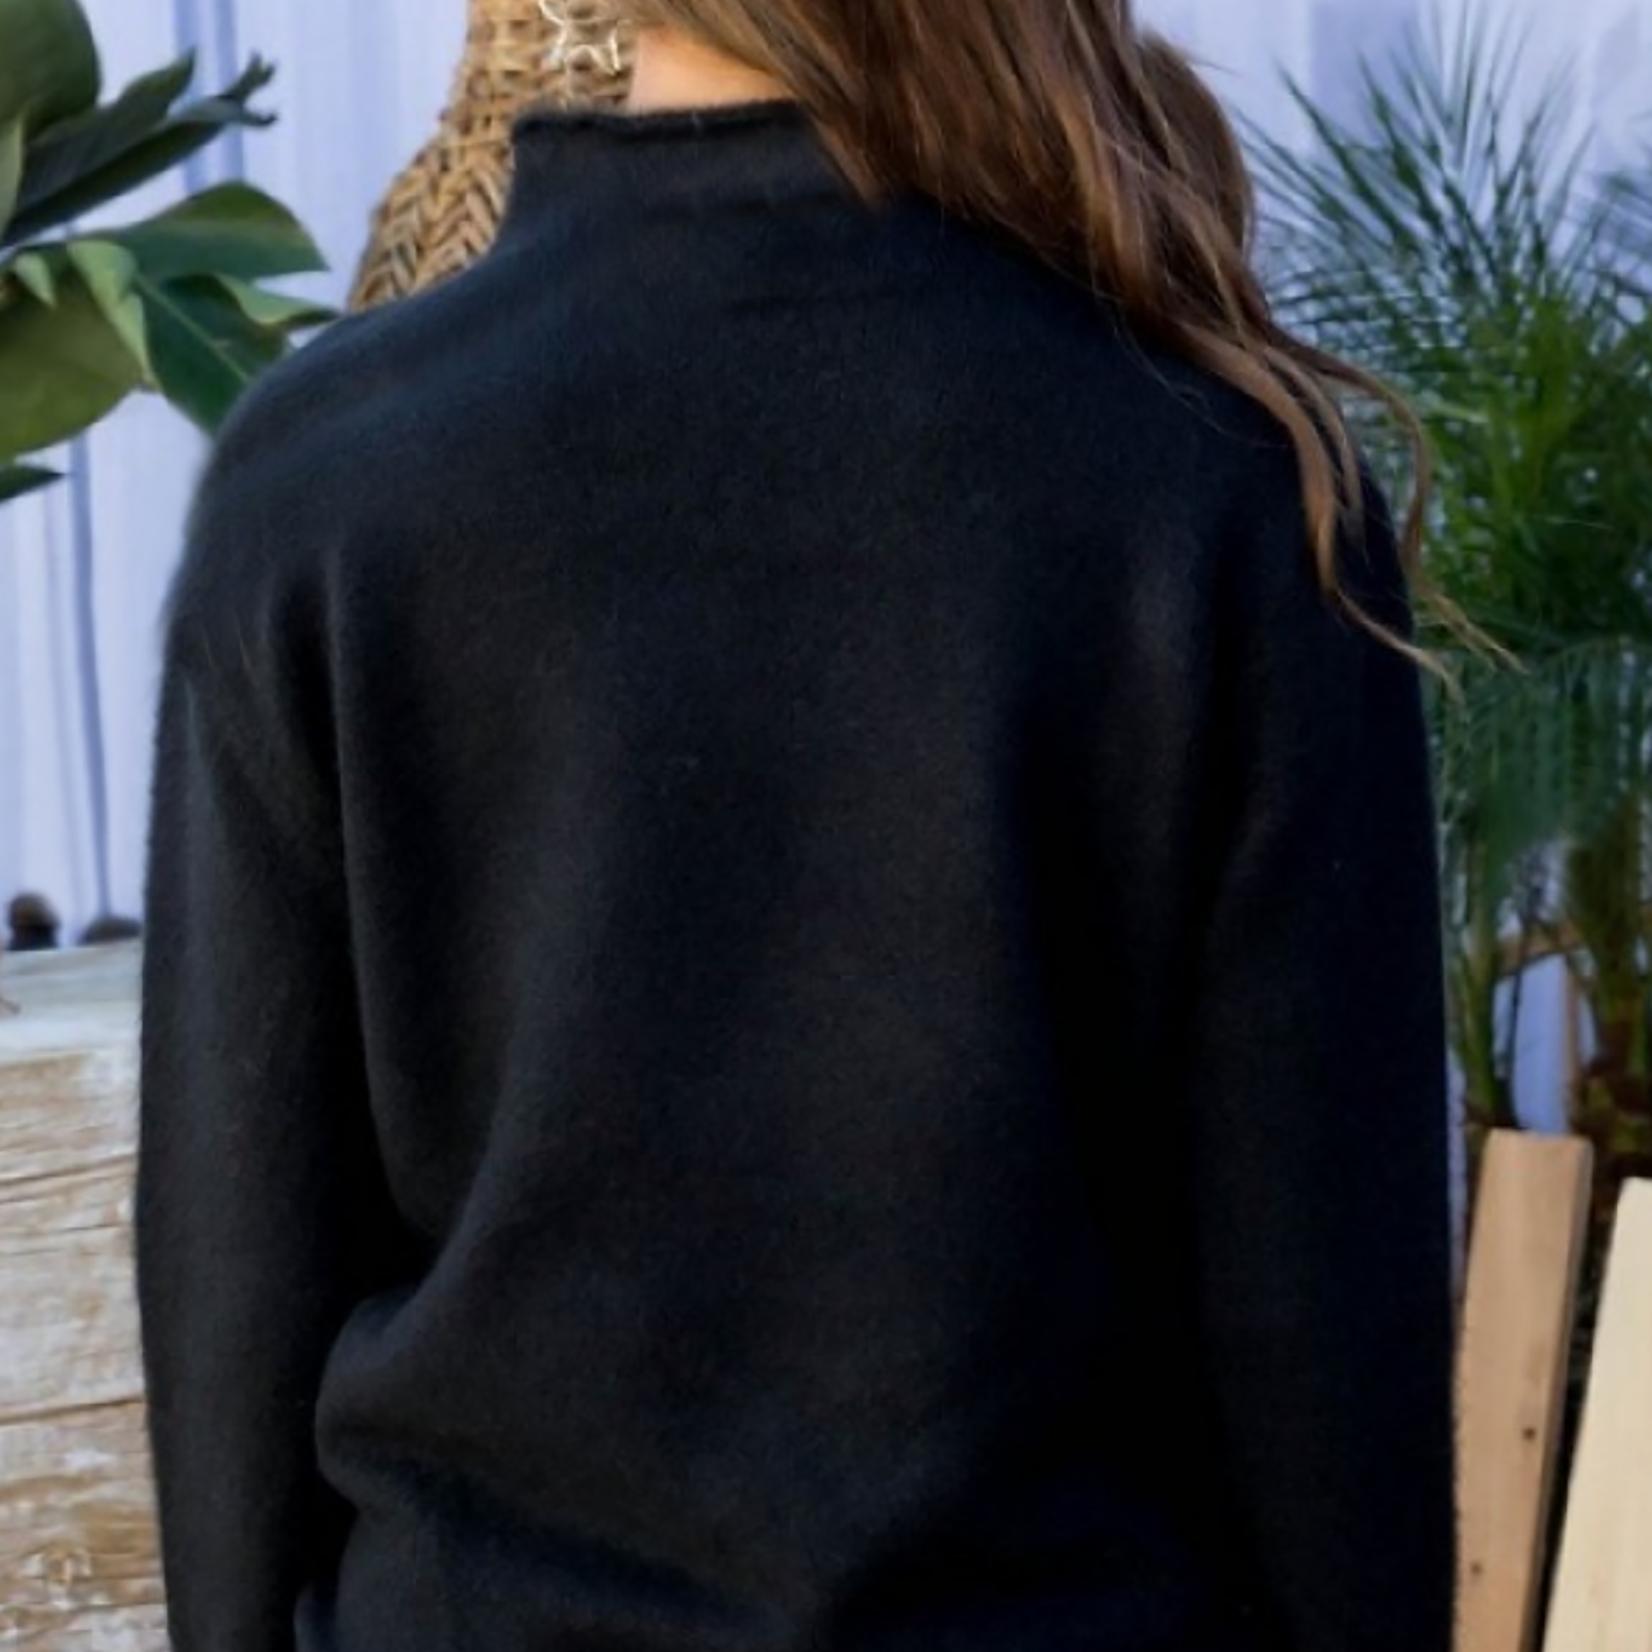 Maddie mock neck sweater